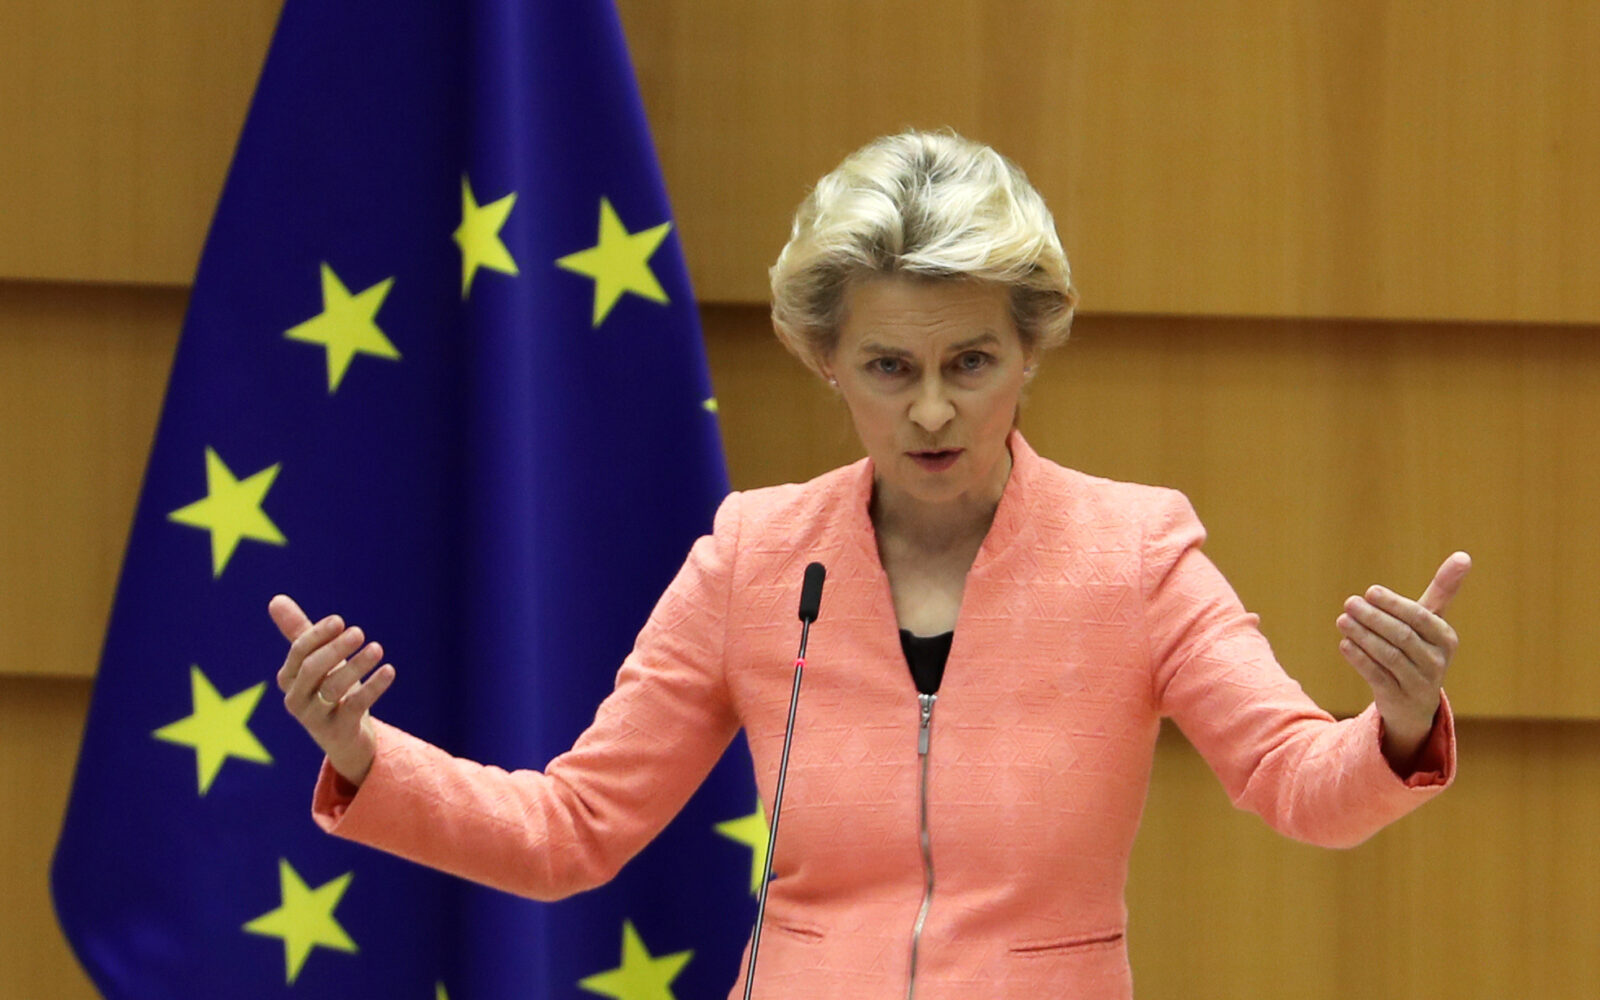 https://www.poslovni.hr/wp-content/uploads/2020/09/2020-09-16T102959Z_219879477_RC2JZI9TDAT4_RTRMADP_3_EU-COMMISSION-1600x1000.jpg